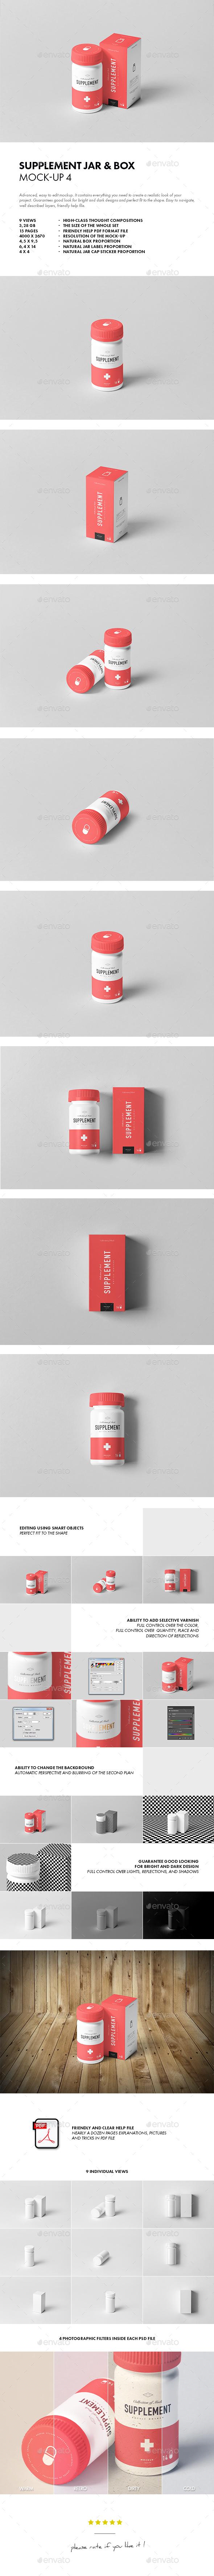 GraphicRiver Supplement Jar & Box Mock-Up 4 20832254